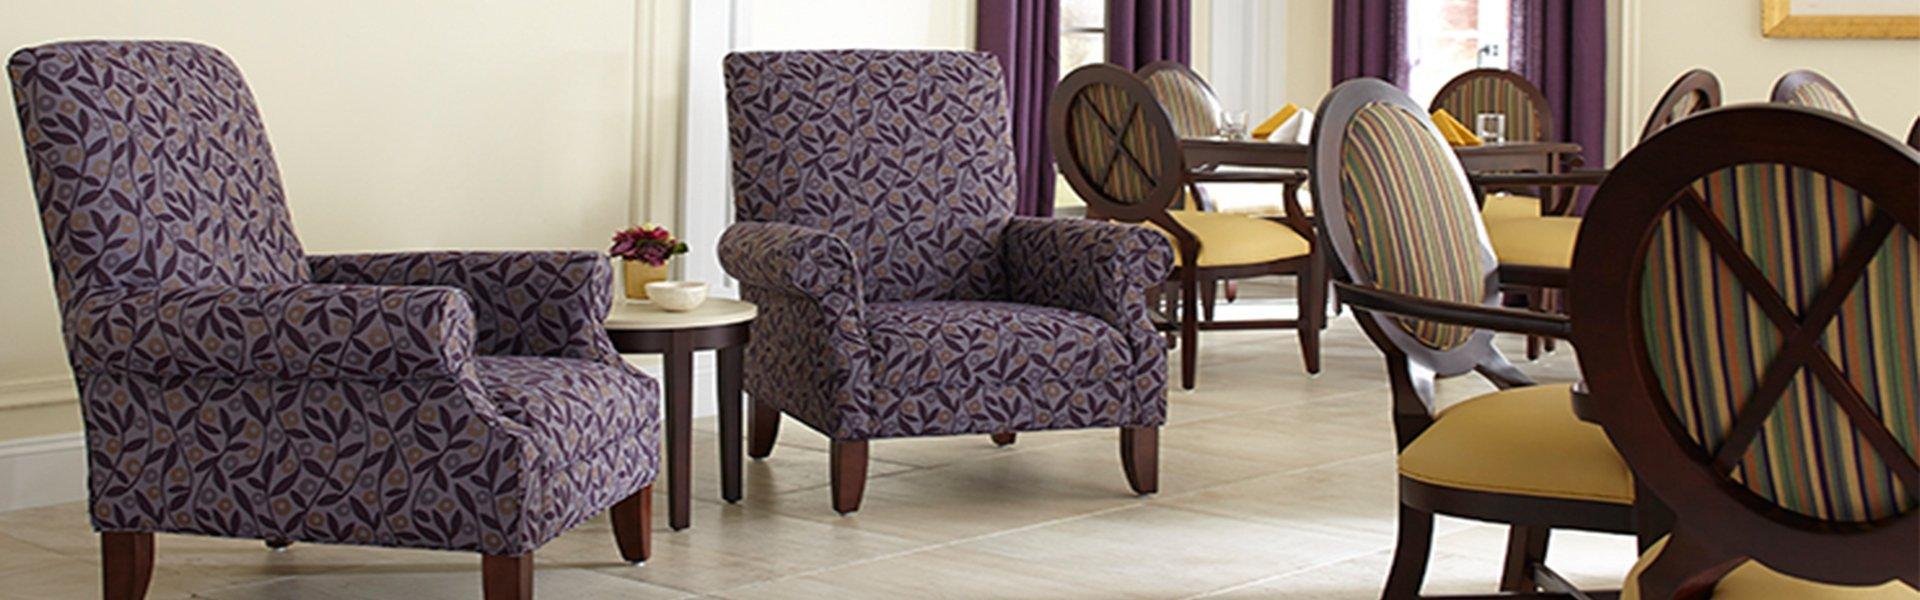 Corilam Regency Chairs